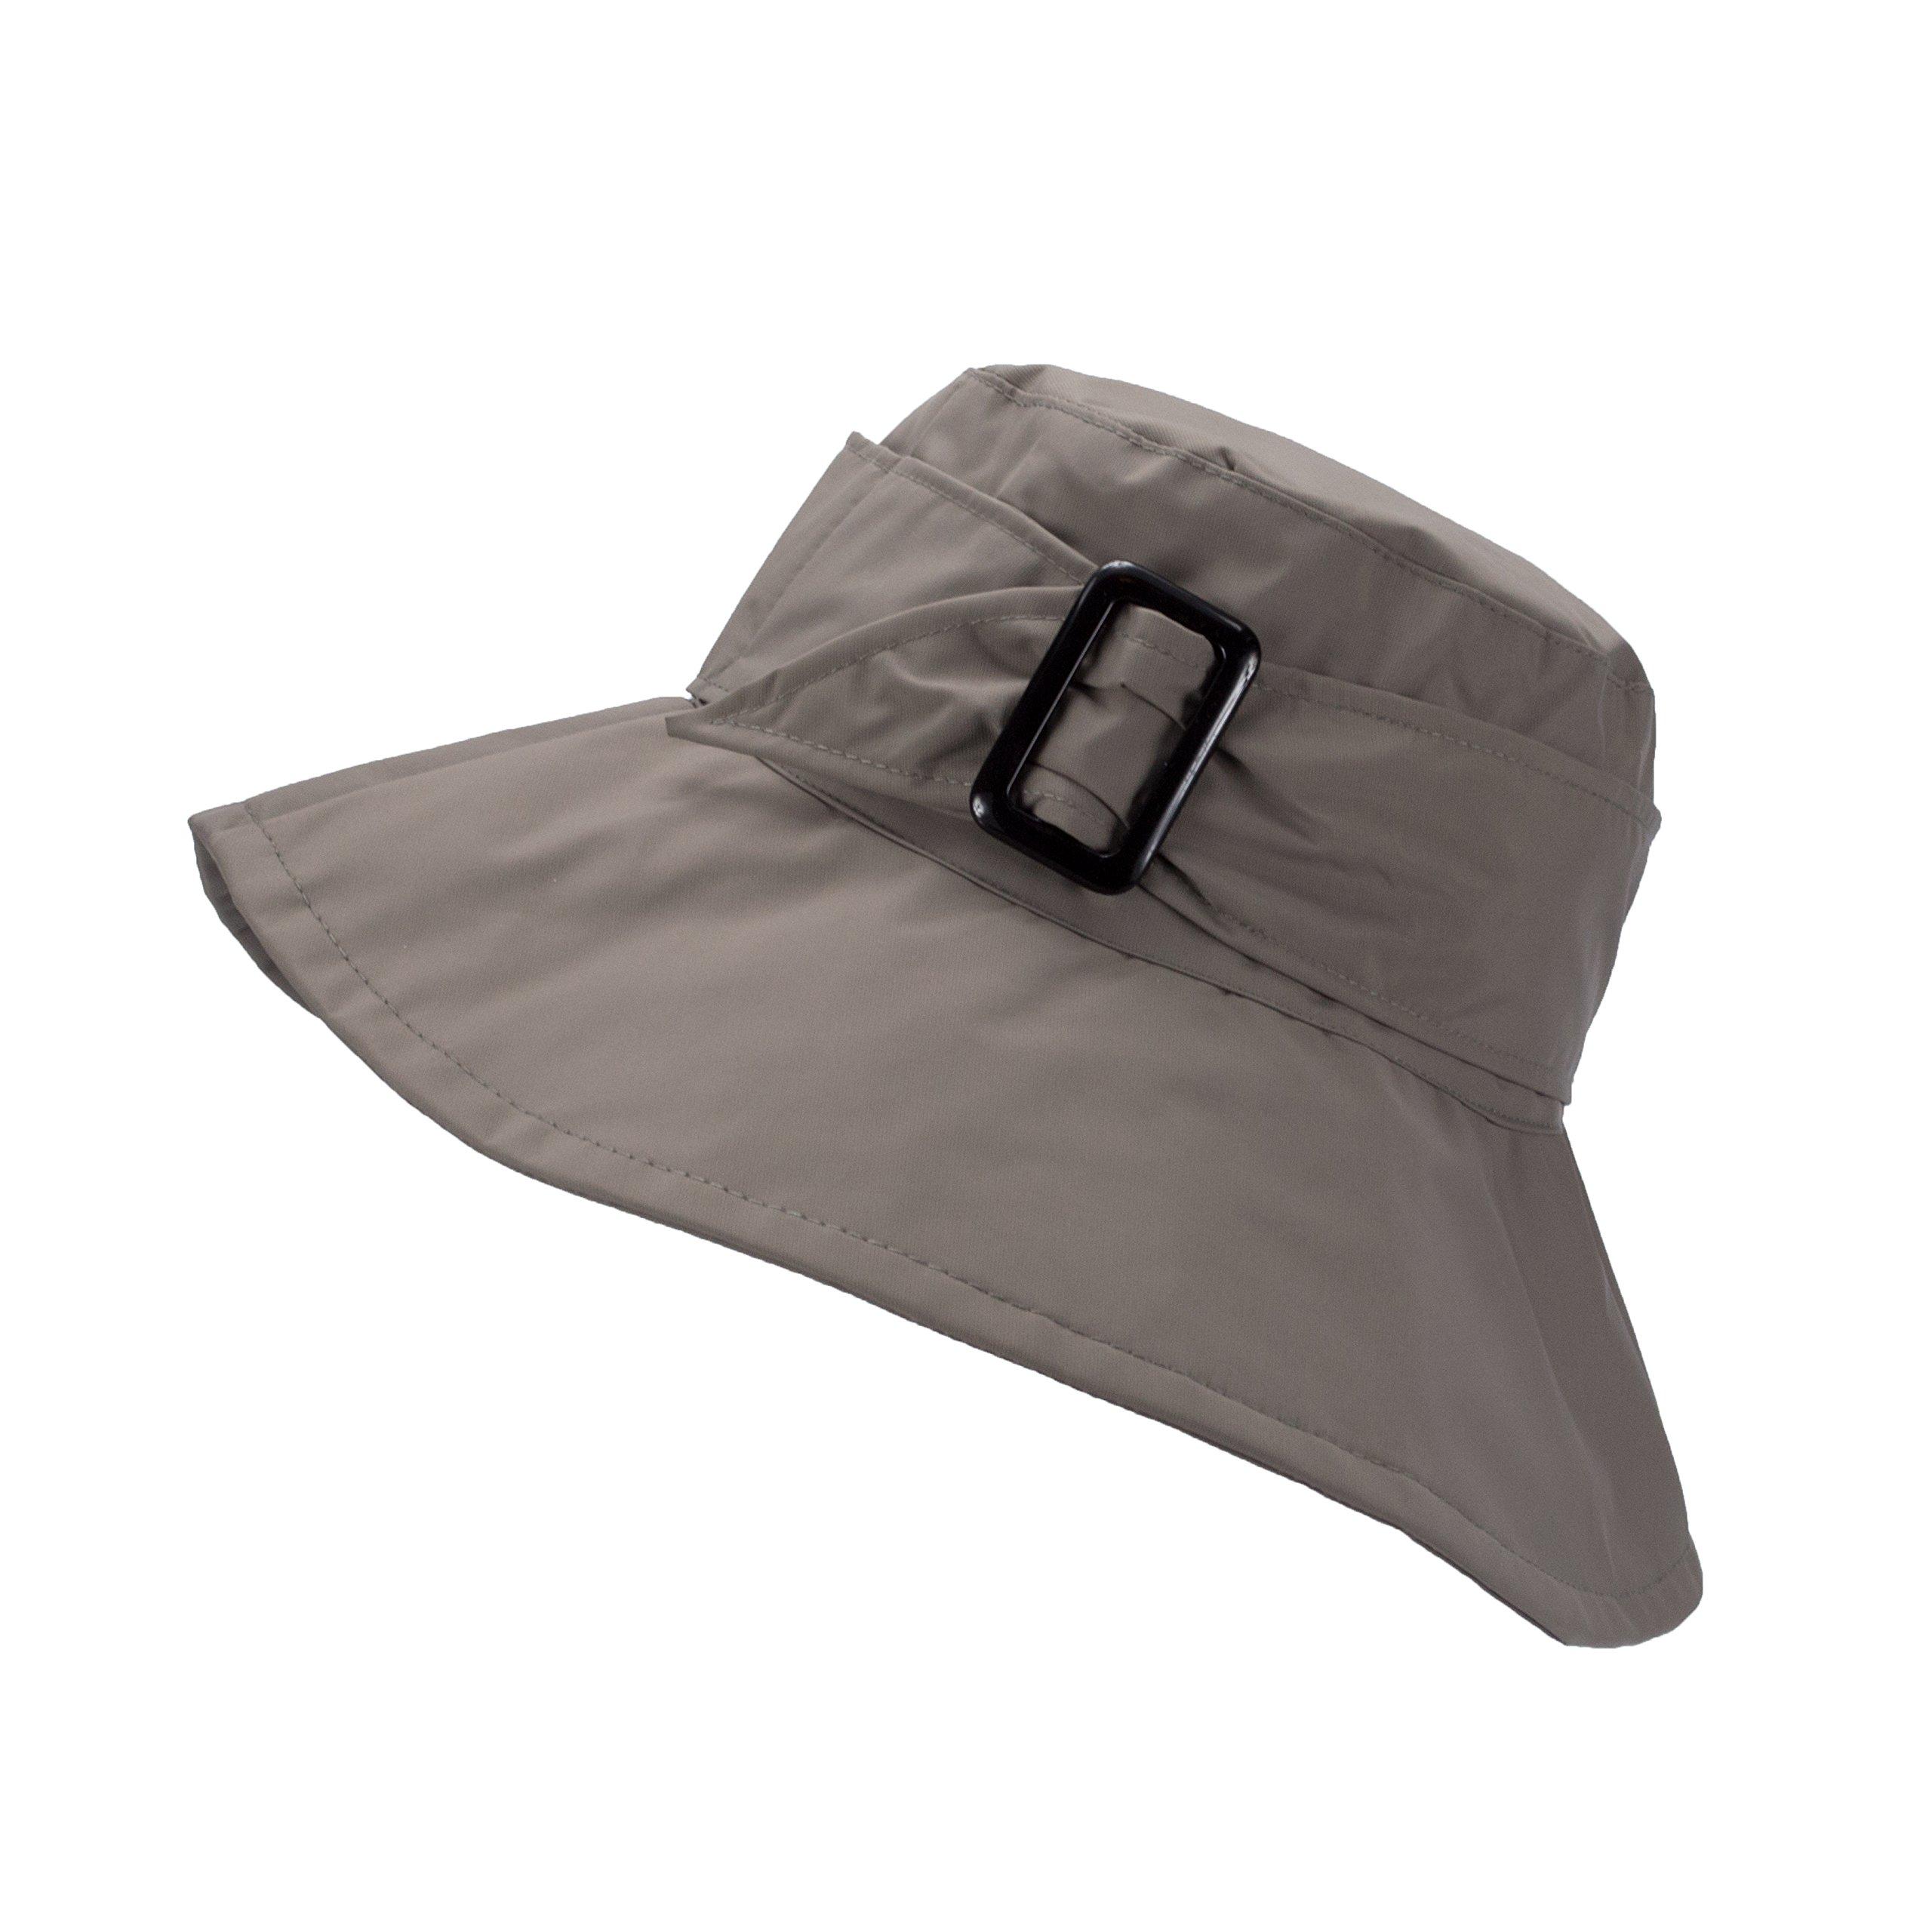 FLH Cute Bucket Rain Hat w/Buckle Accent, 3.5 inch Wide Brim, Roll-Up Packable (Grey)